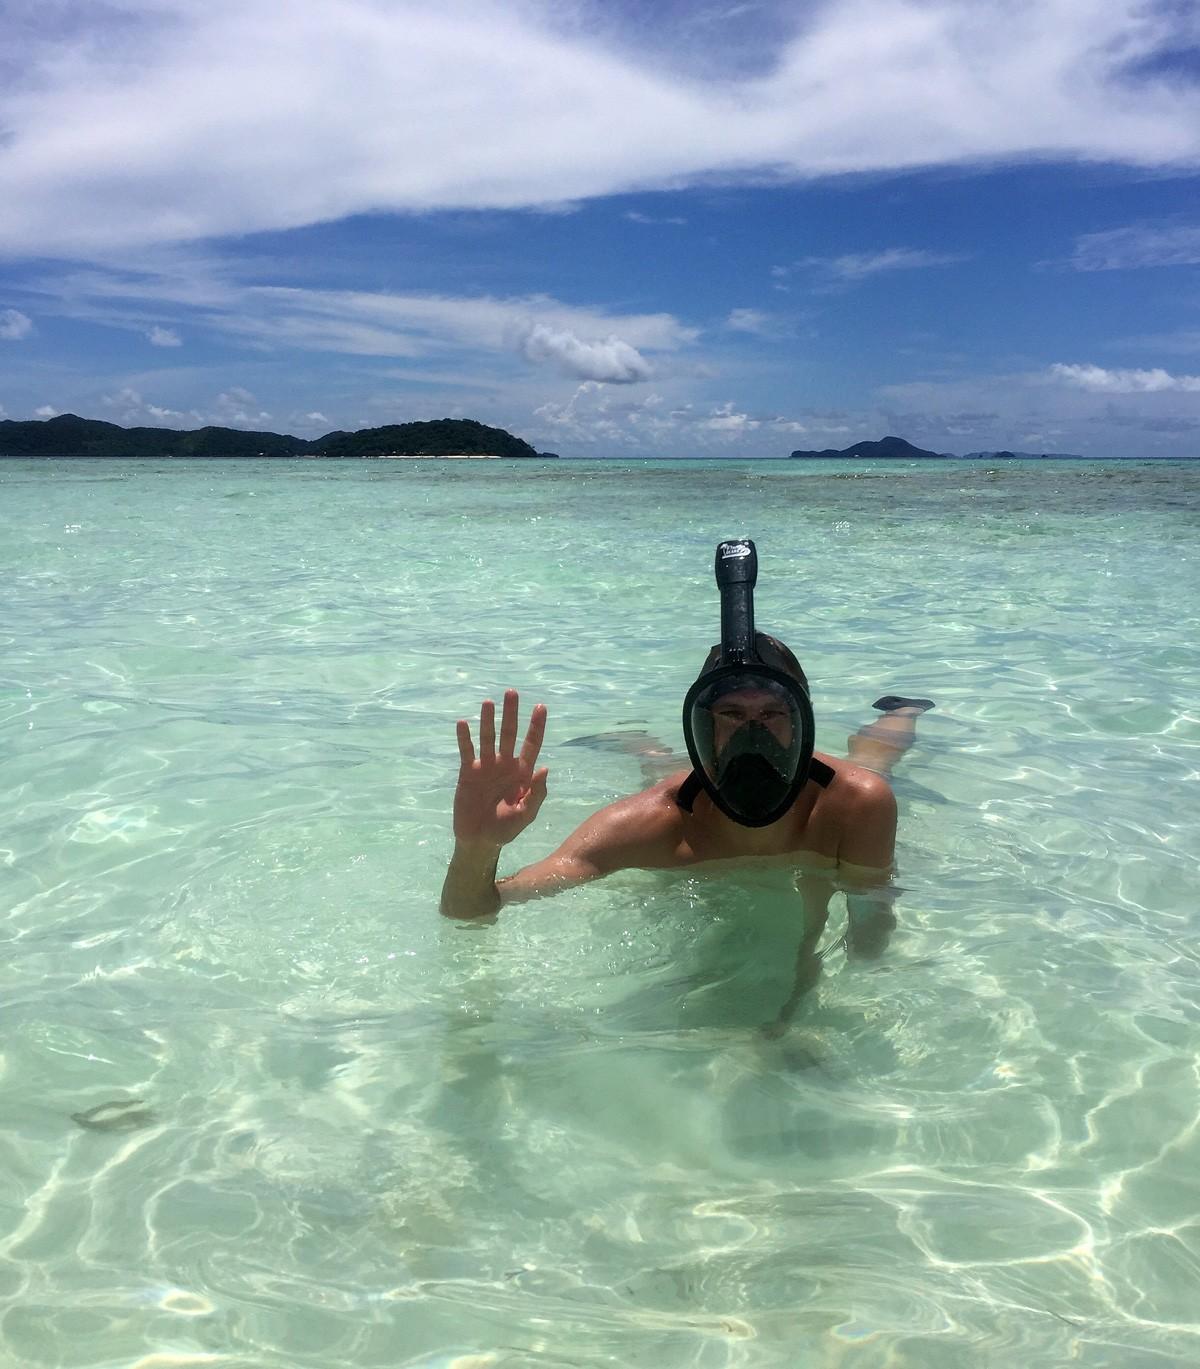 Malcapuya island snorkeling - Andrei from Travelblogstories